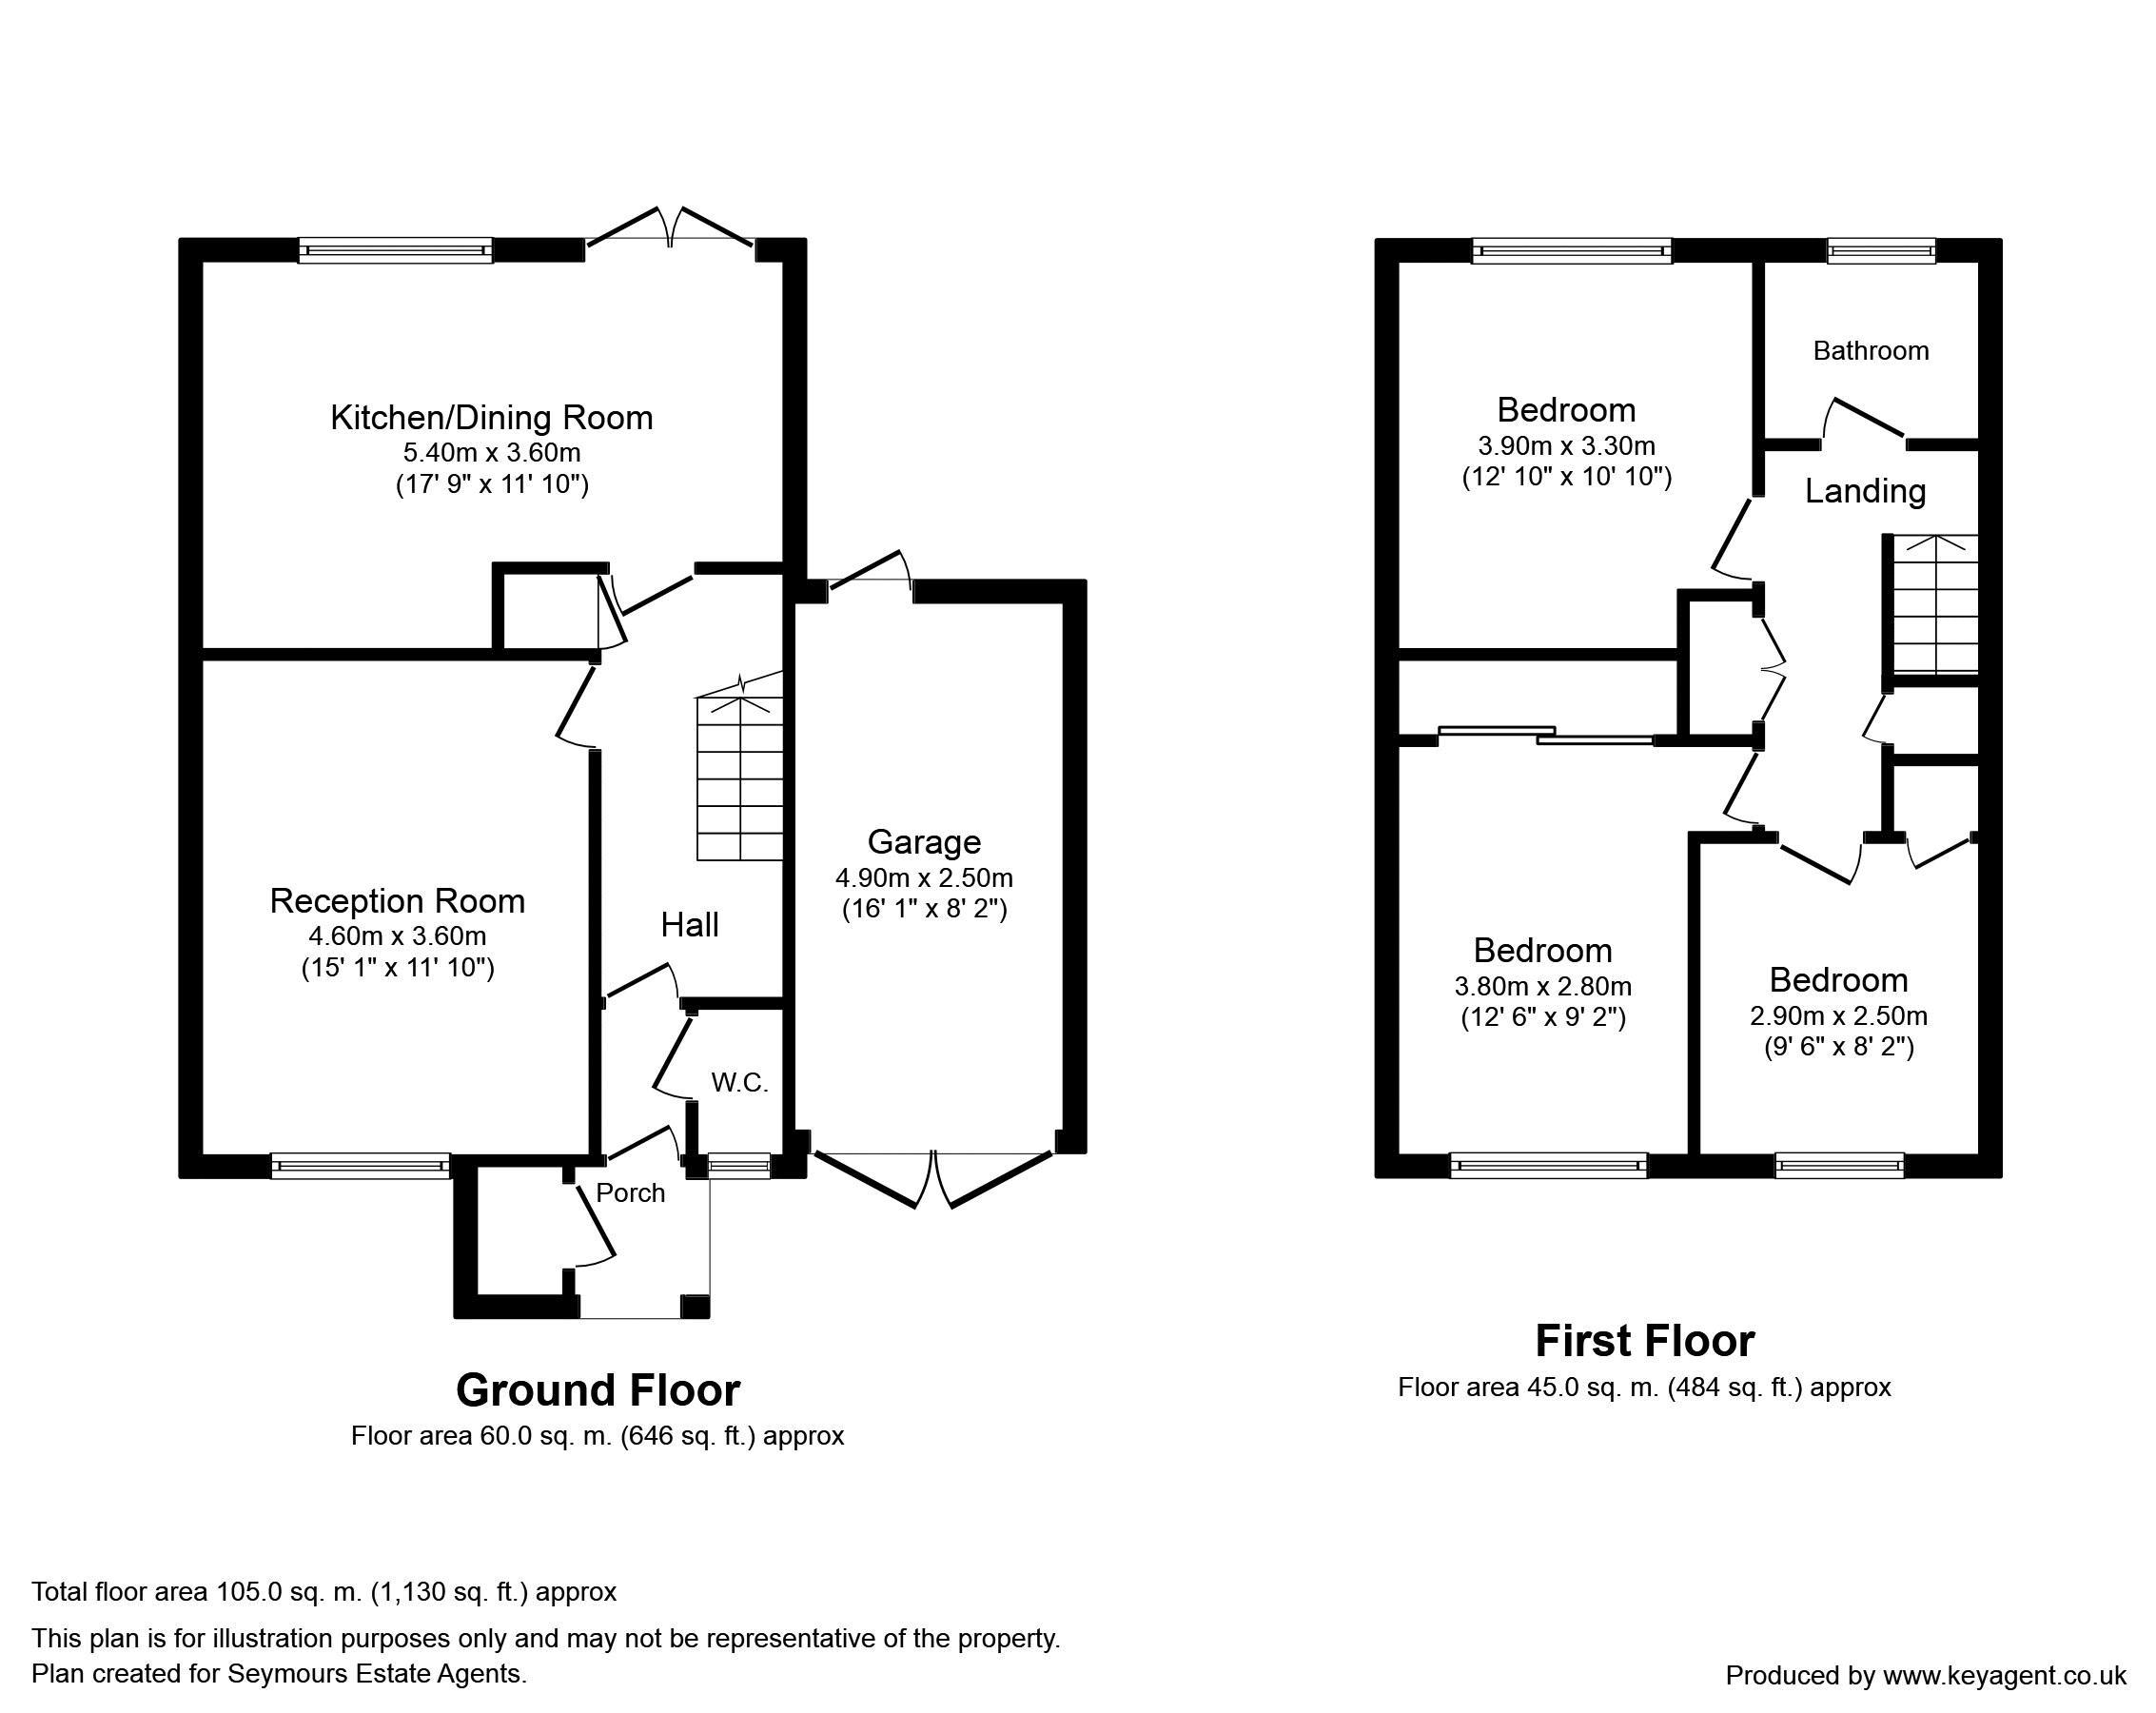 3 bedroom property for sale in Cinnamon Gardens, Guildford